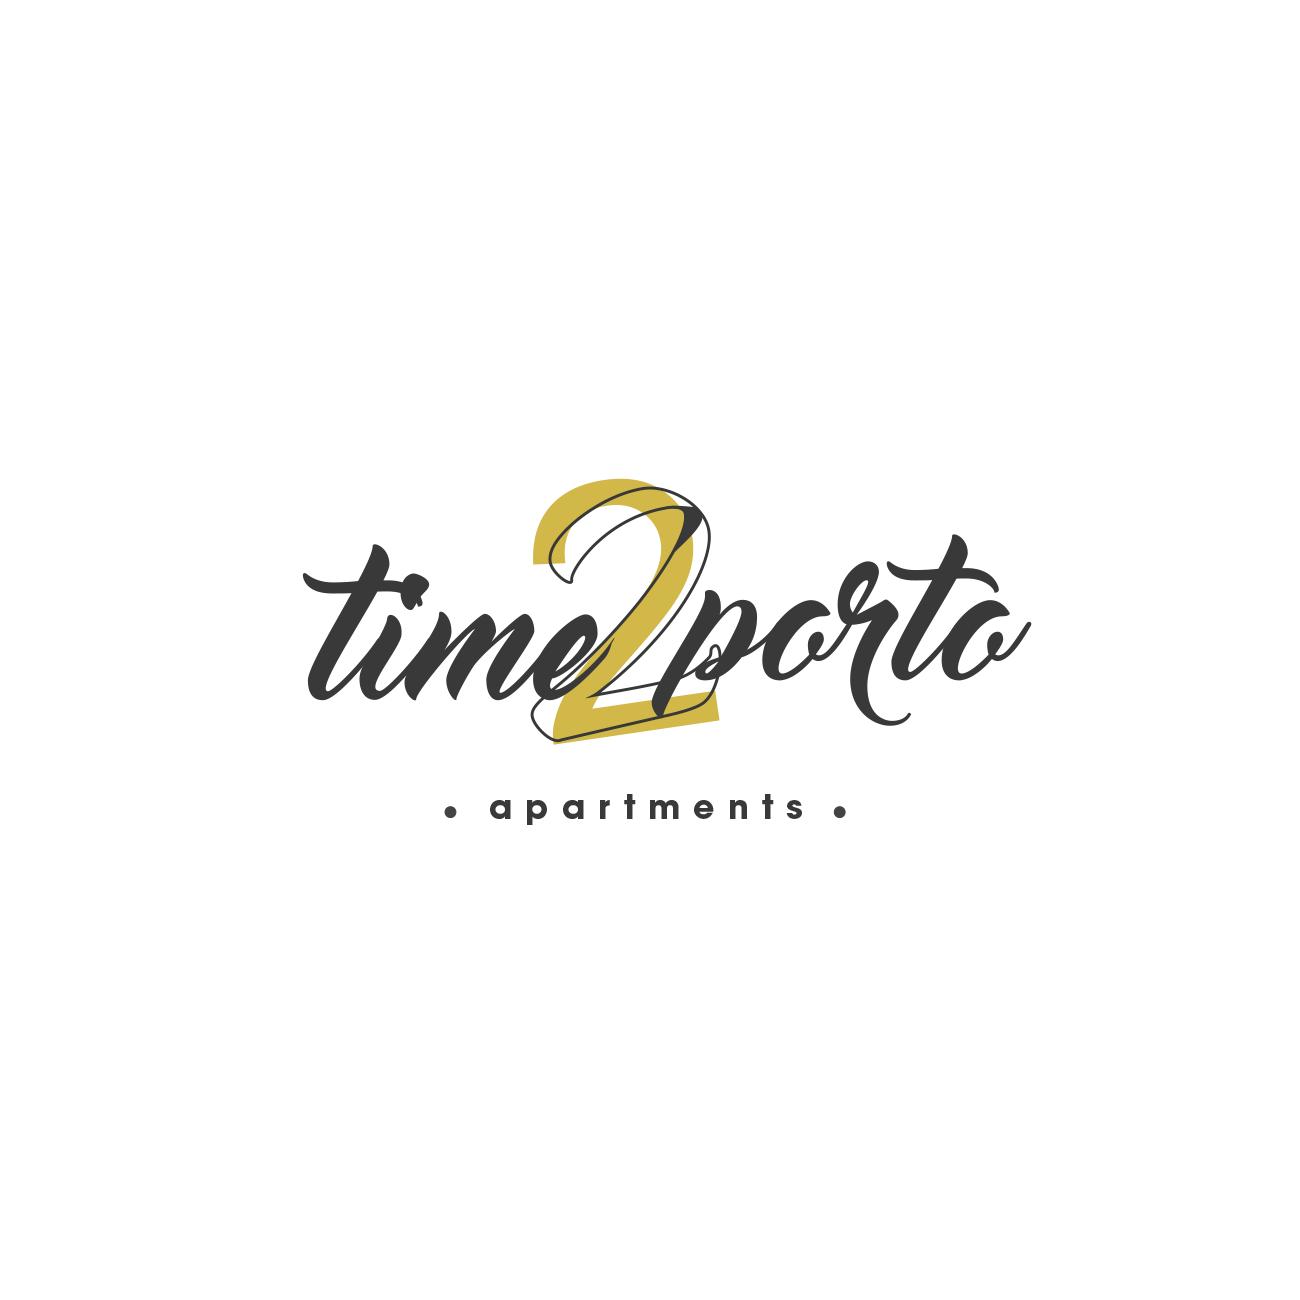 Logotipo alojamento local time2porto